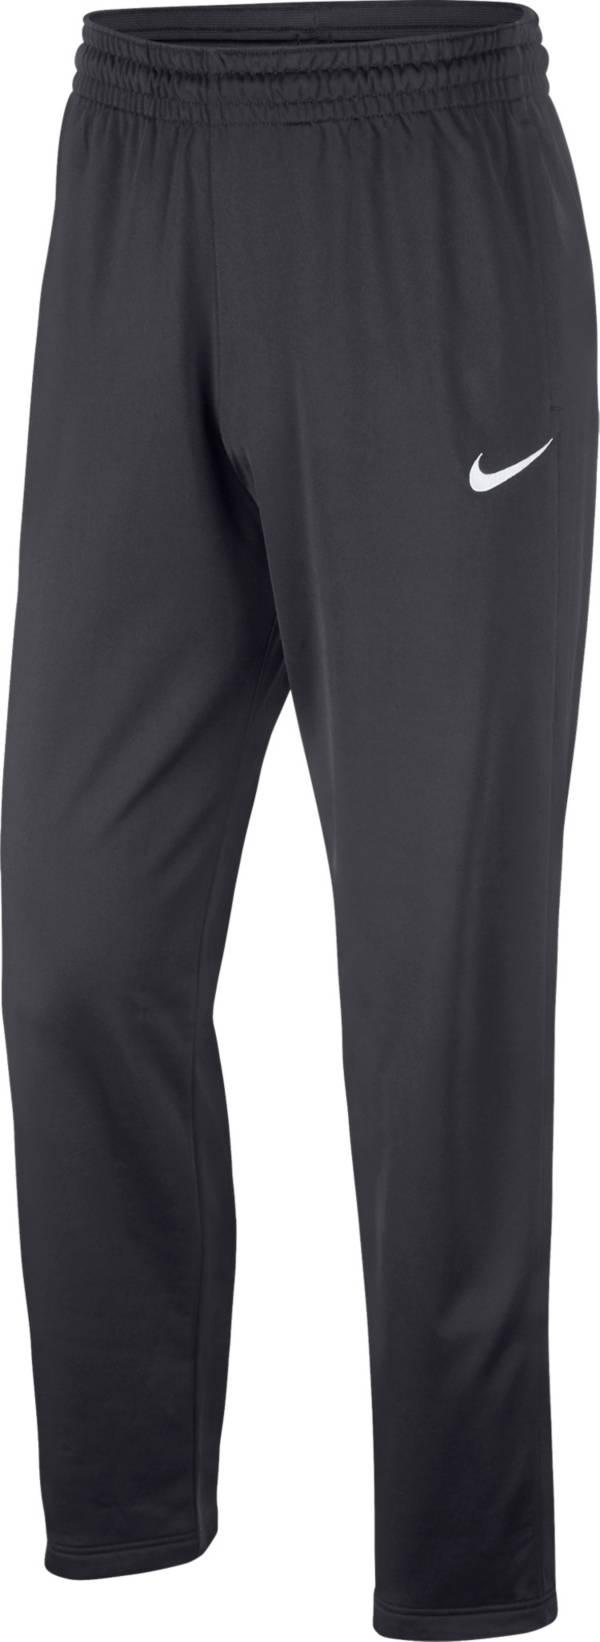 Nike Men's Dri-FIT Rivalry Basketball Pants (Regular and Big & Tall) product image